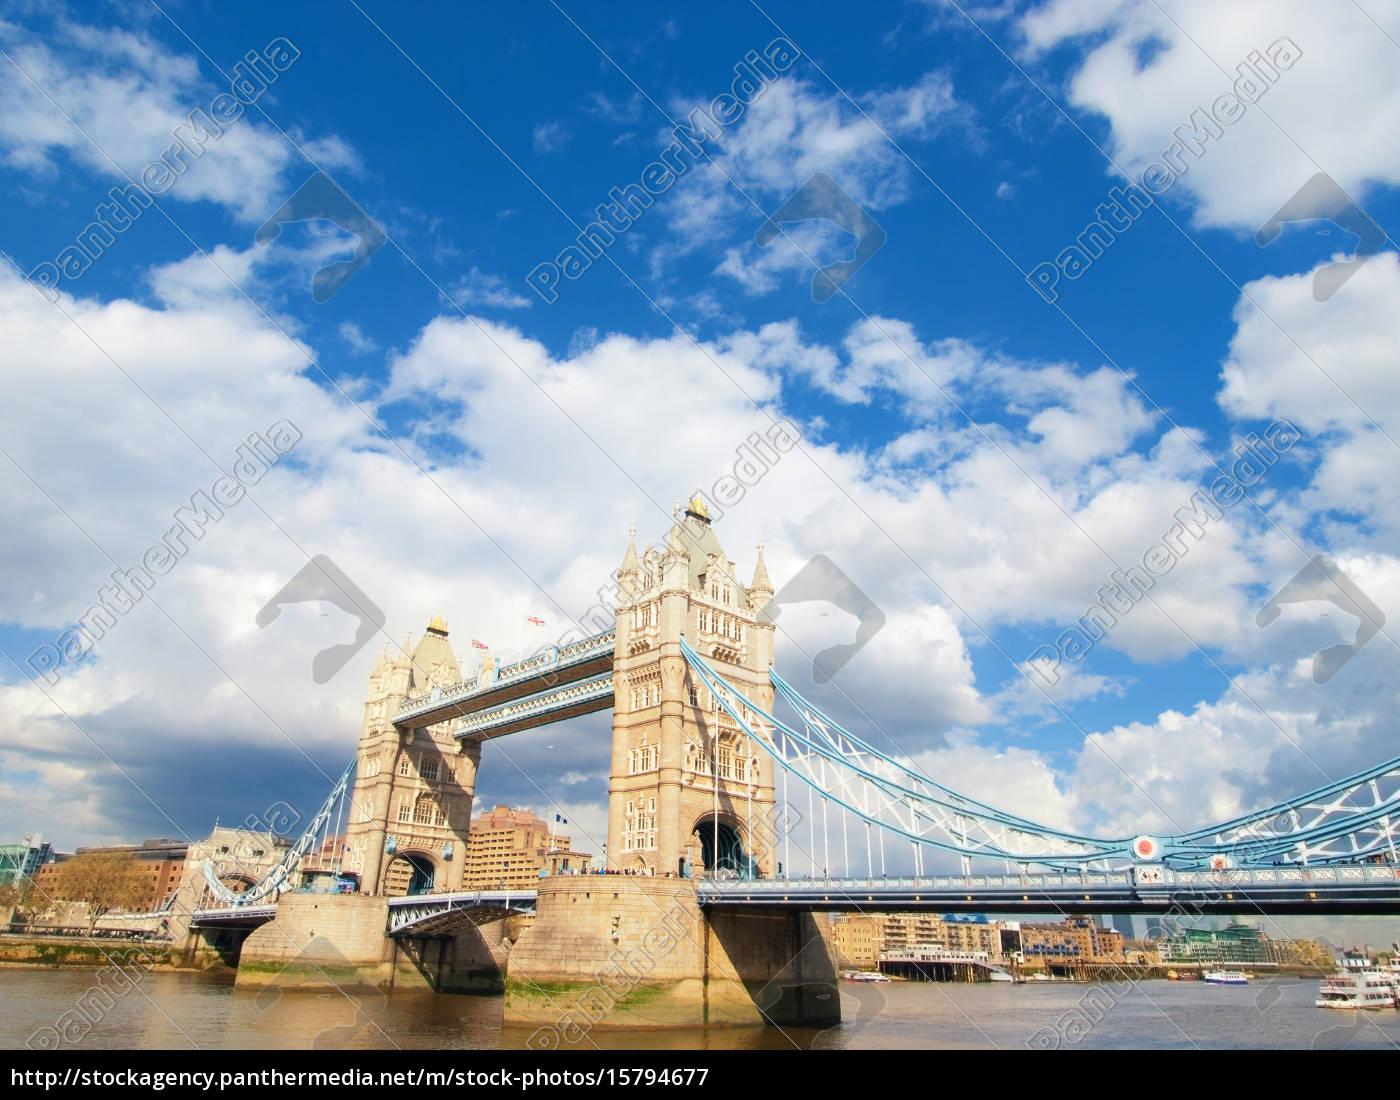 tower, bridge, , london, tower, bridge, , london, tower, bridge, - 15794677